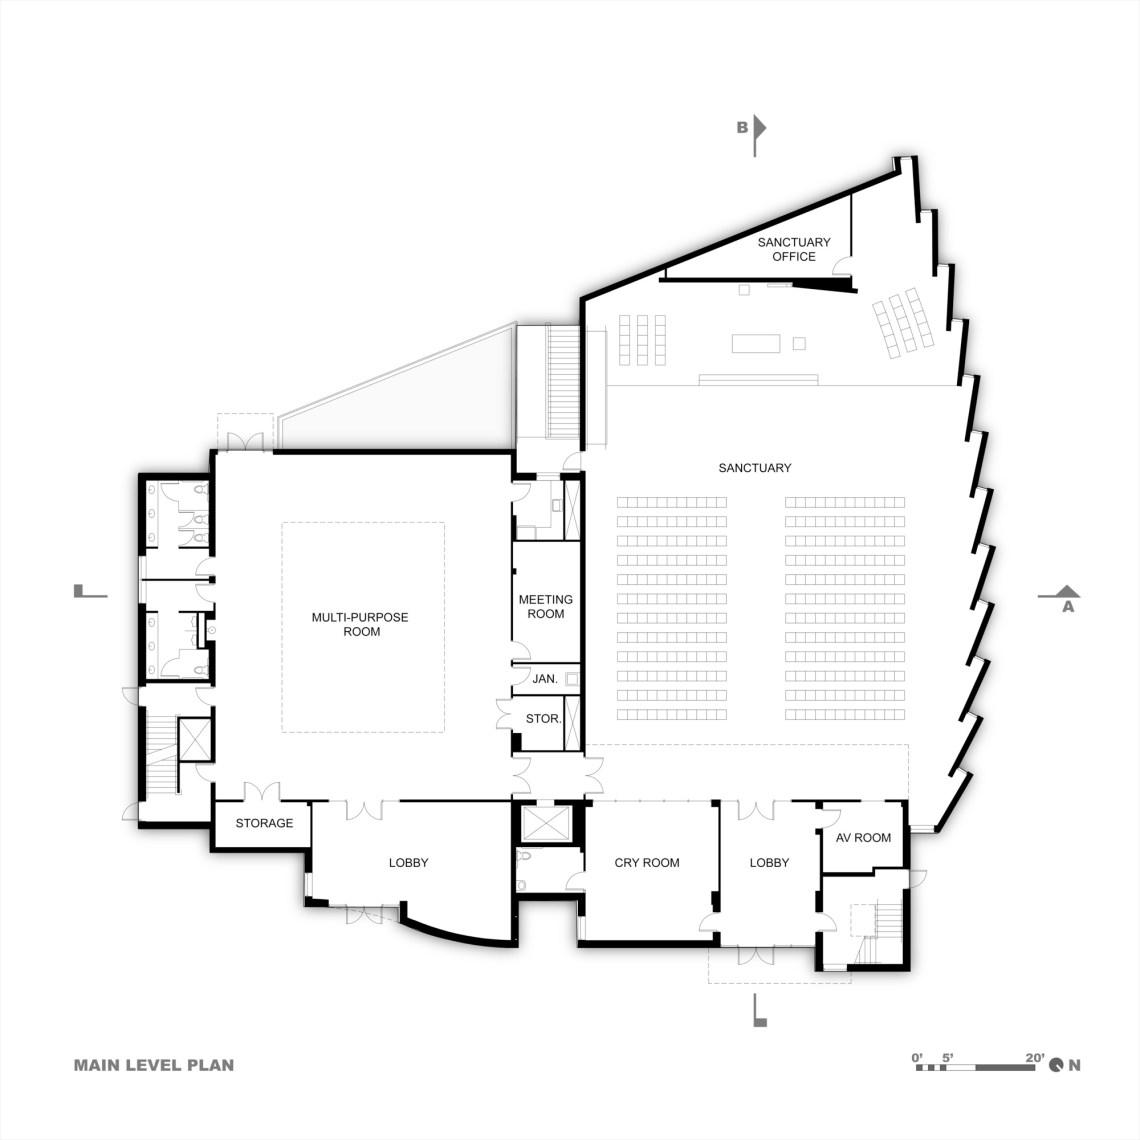 Korean Presbyterian Church Arcari Iovino Architects